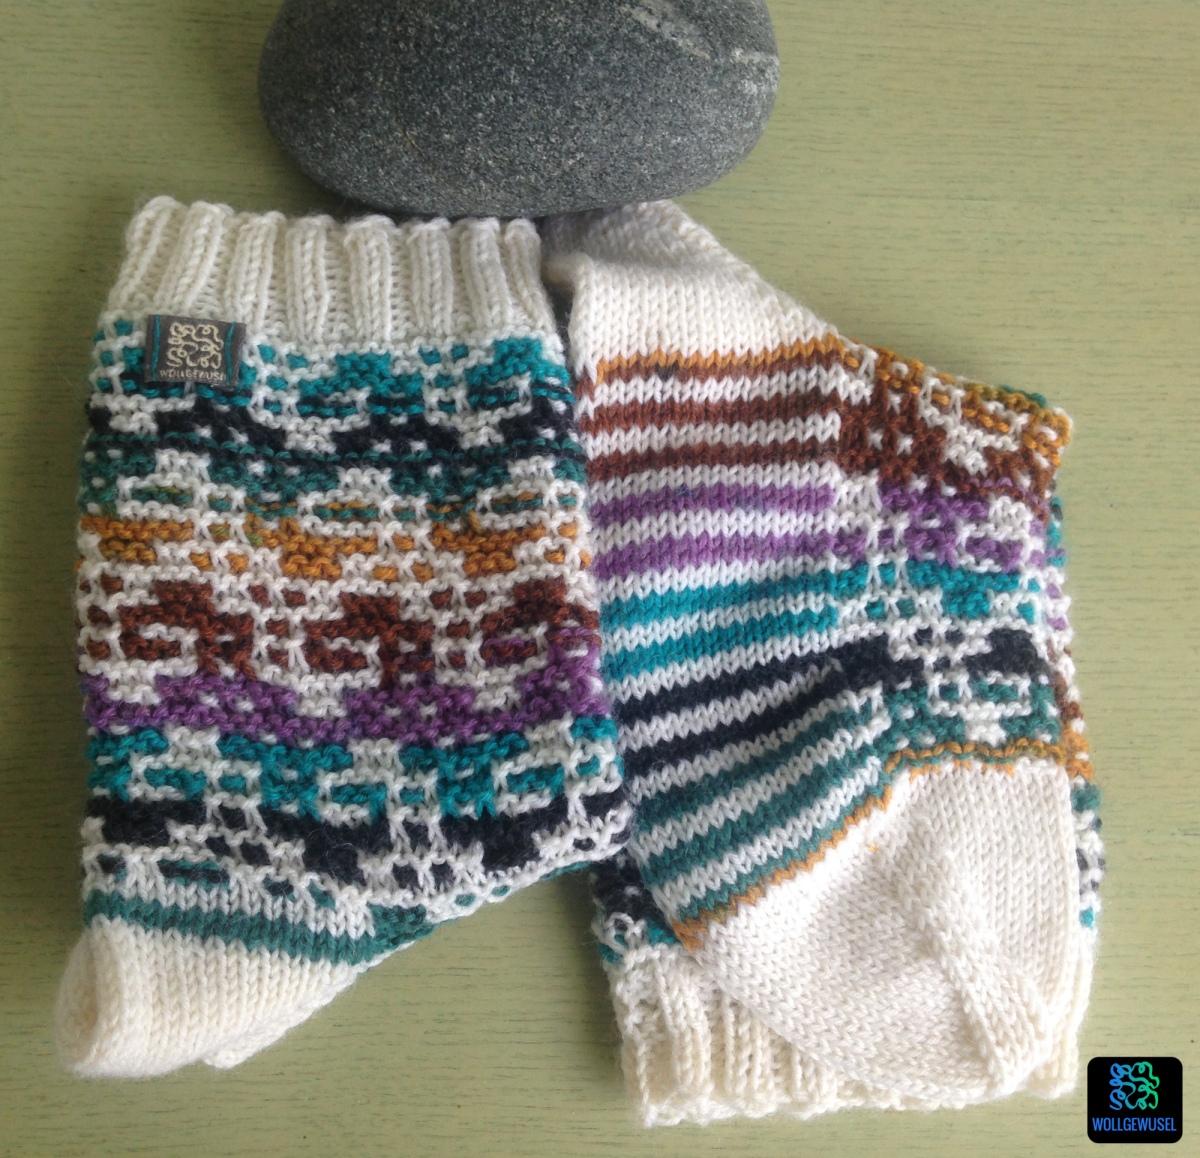 Mosaik-Socken: petrol/erdig/flieder in Wattewolken